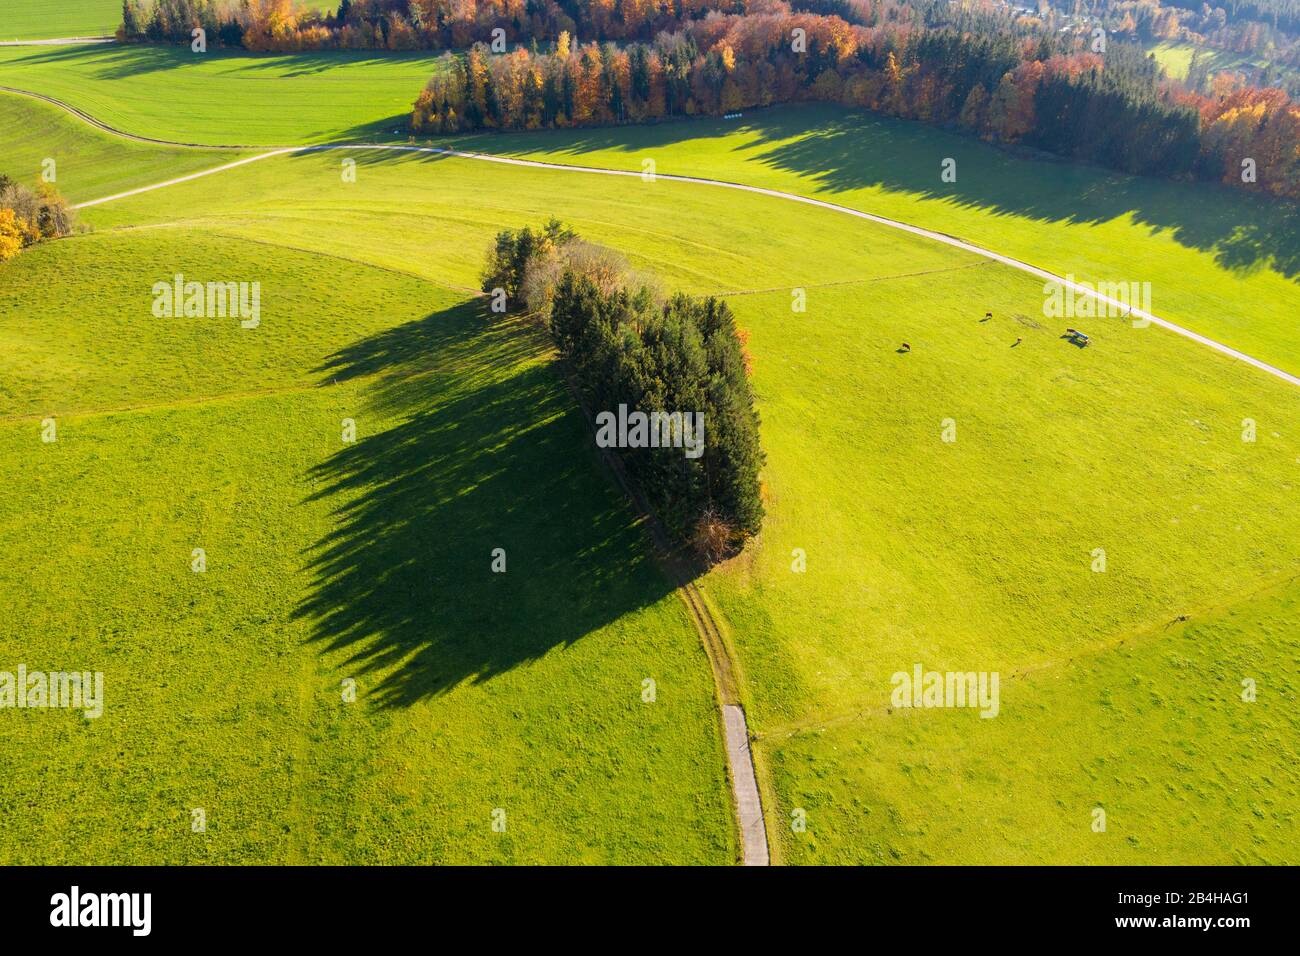 Group of trees on pastureland near Peretshofen, Tölzer Land, drone recording, Alpine foothills, Upper Bavaria, Bavaria, Germany Stock Photo